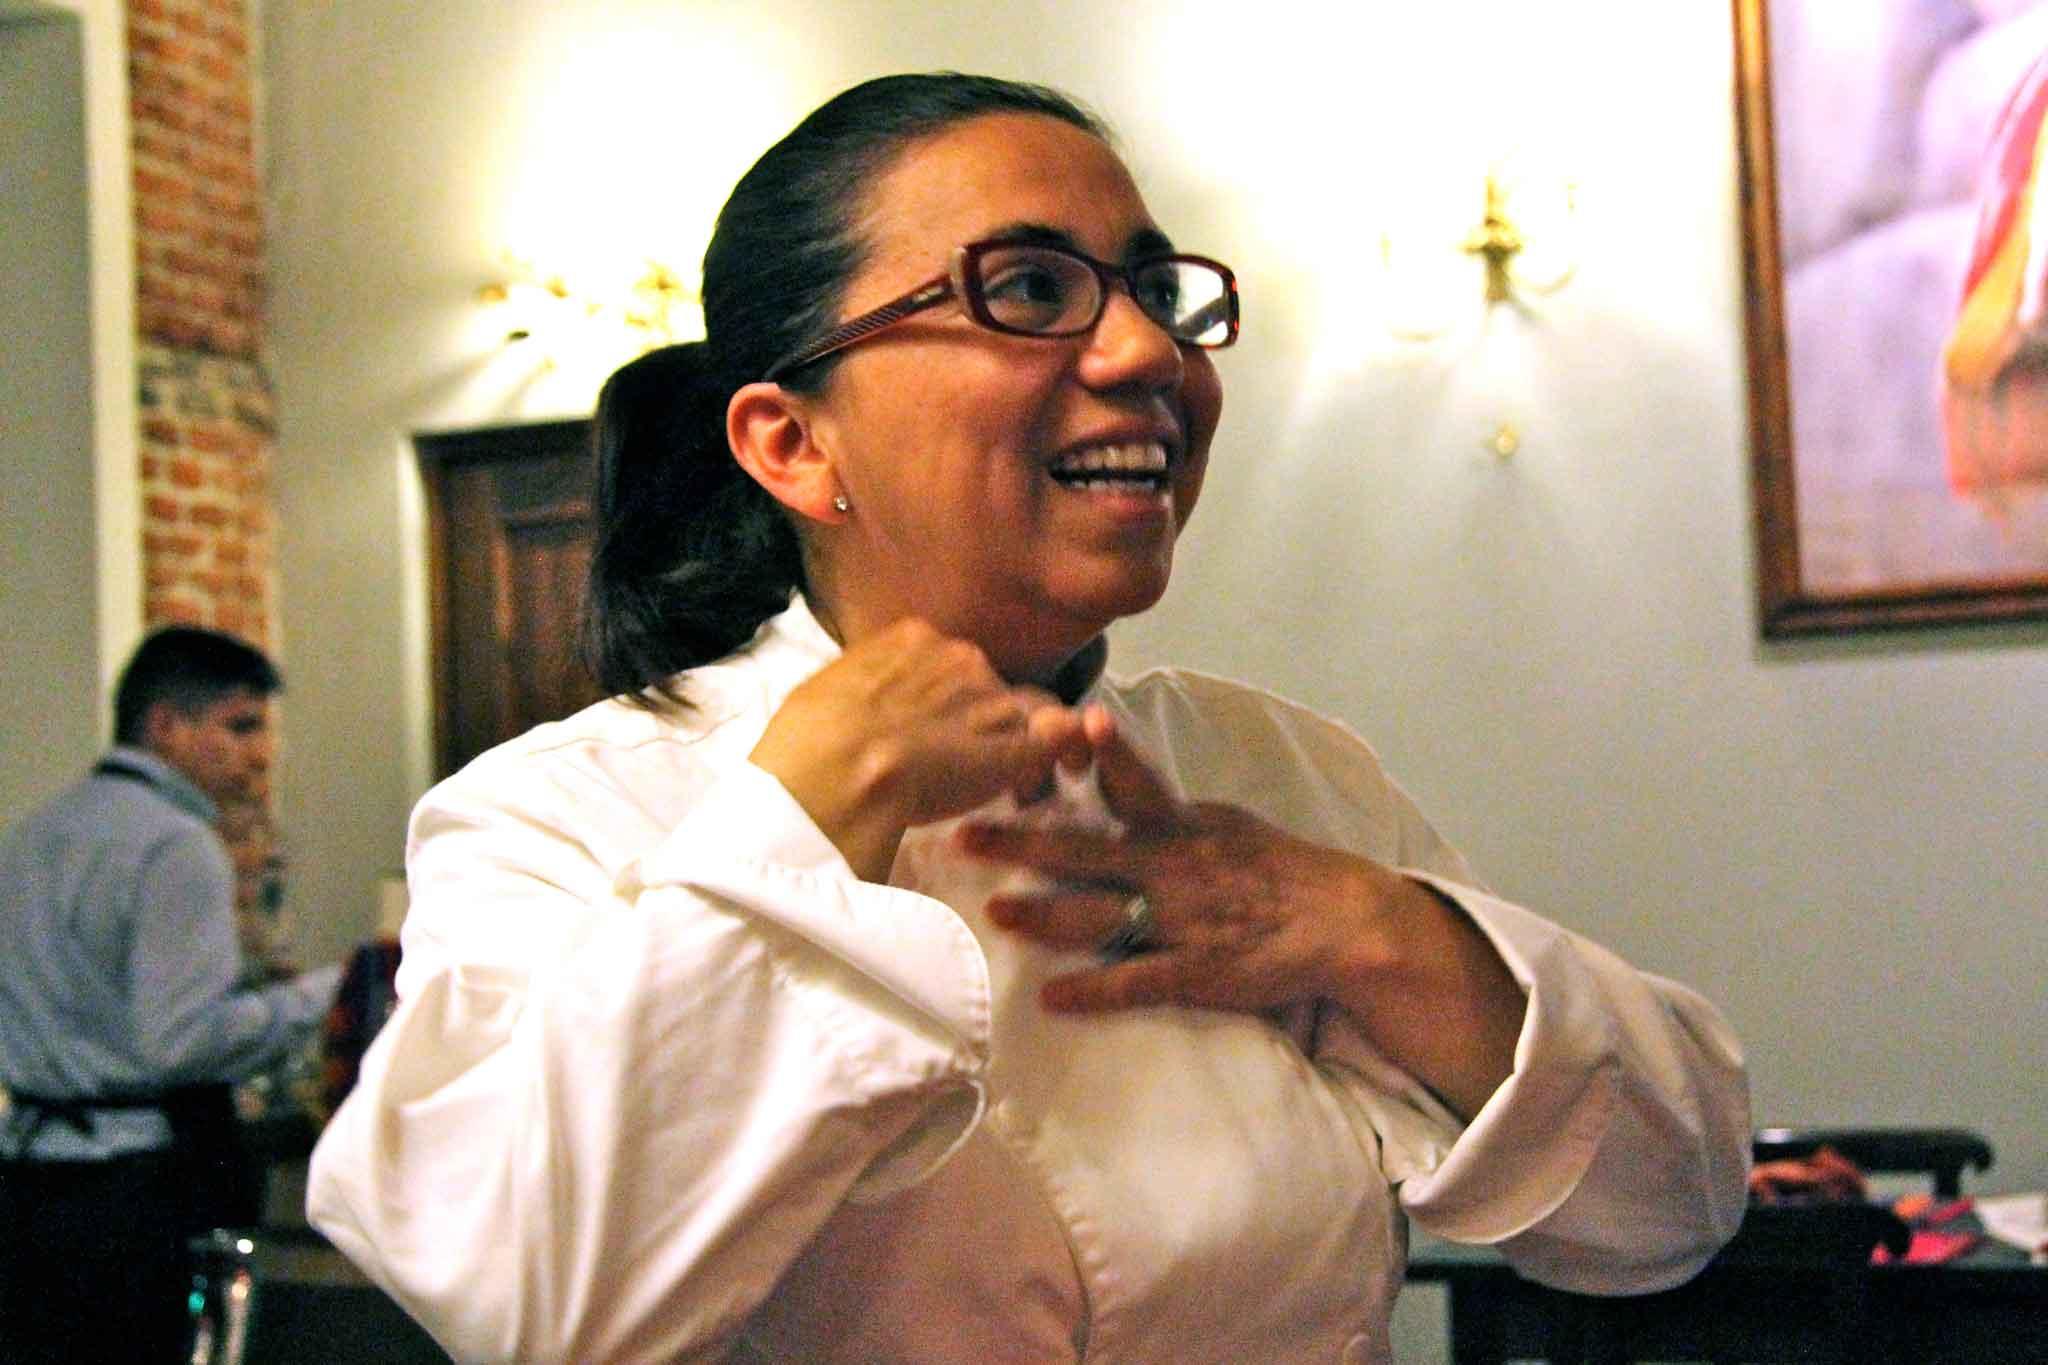 Sheilla Diaz